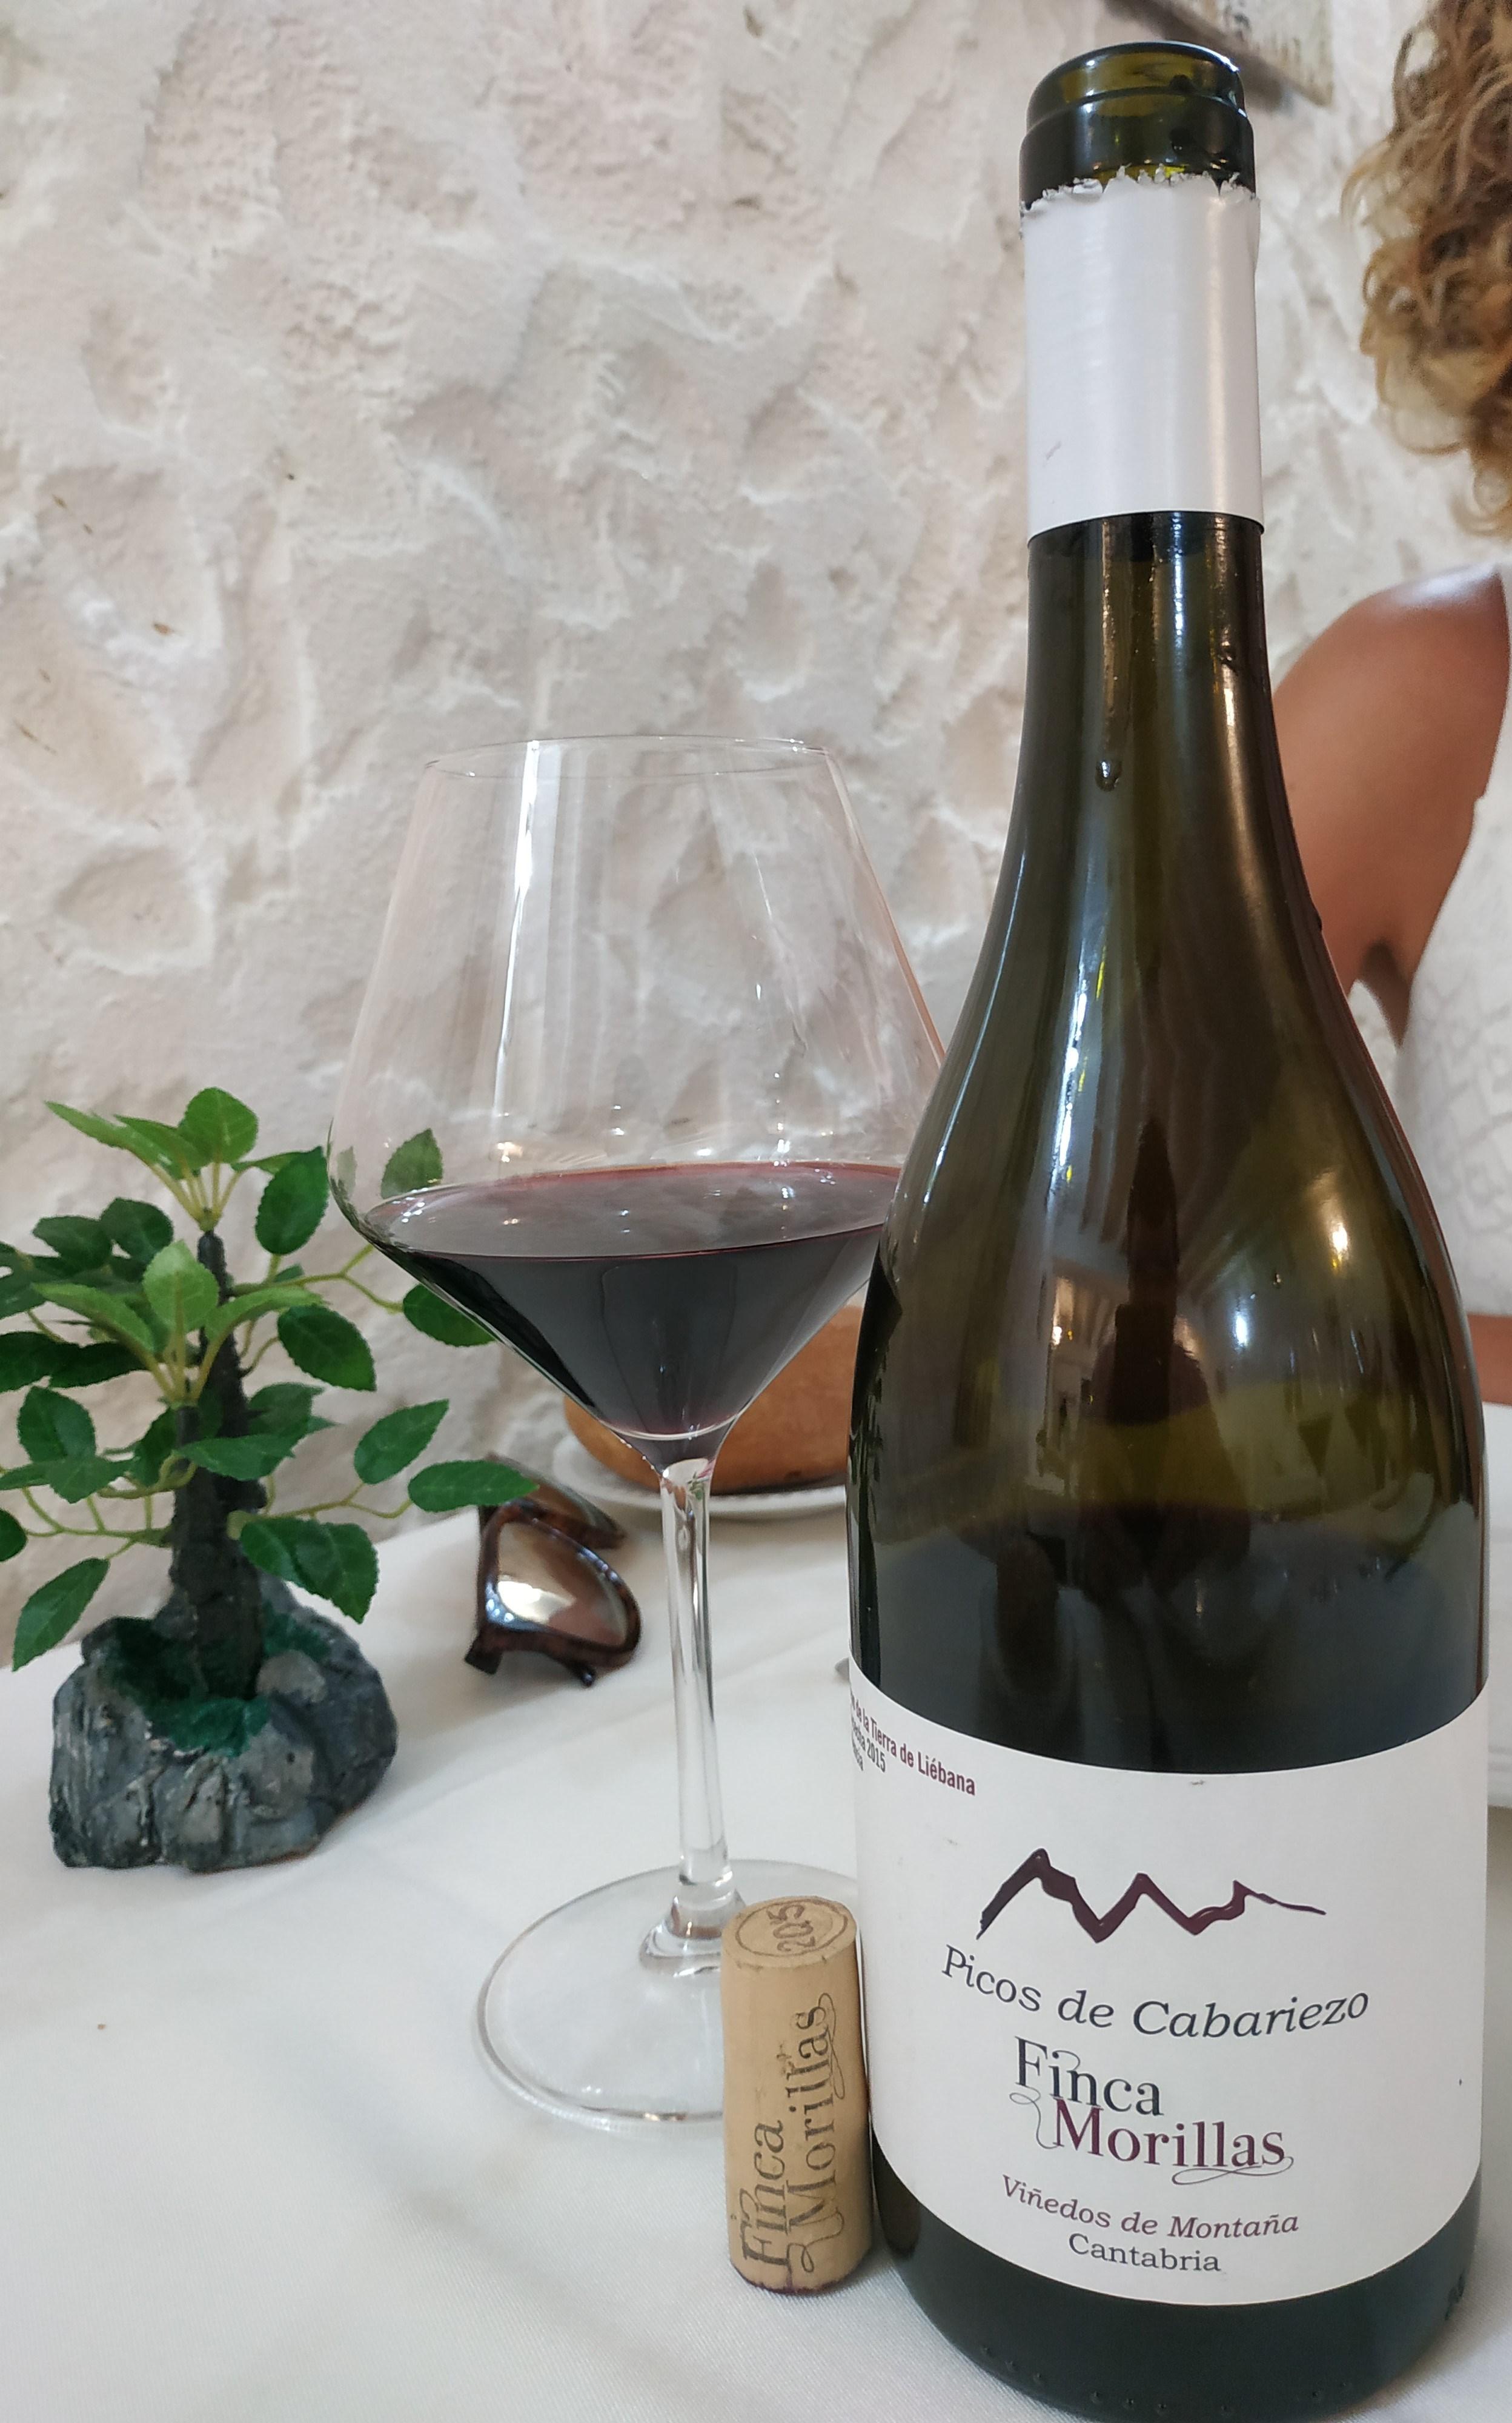 Restaurante La nogalea Finca Morillas 2015 (VT Liébana)